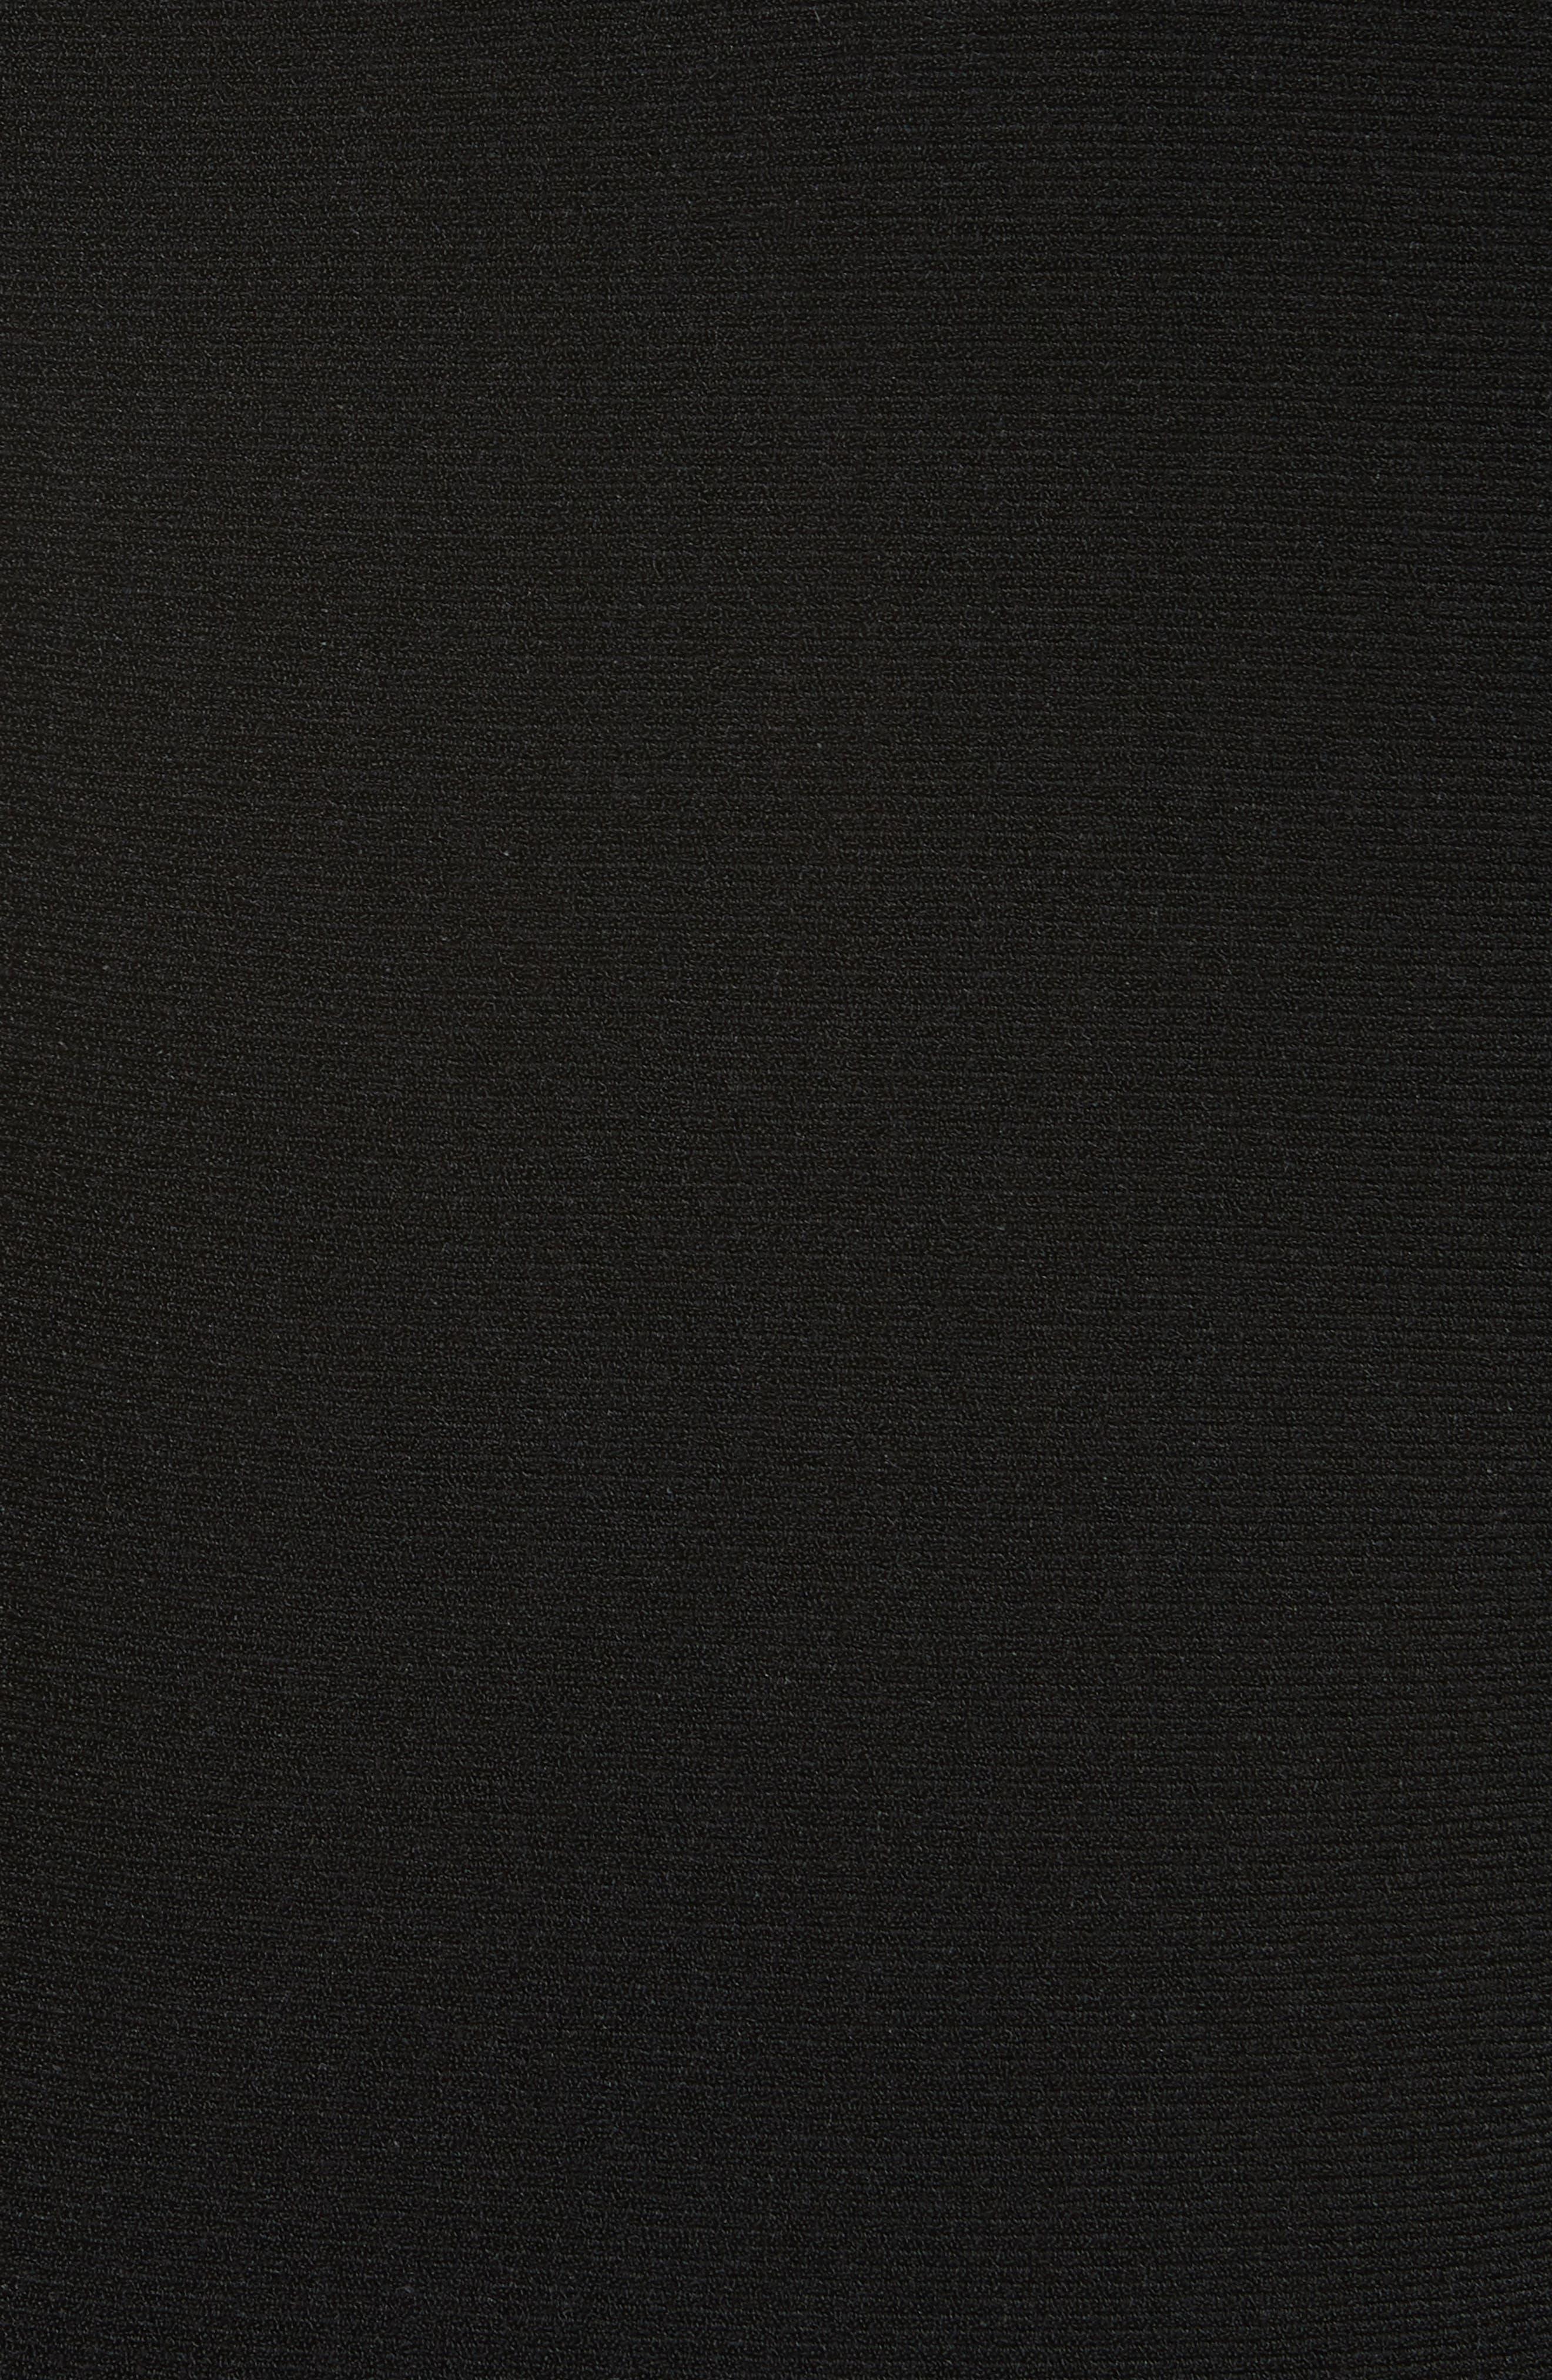 Metallic Pleat Fit & Flare Dress,                             Alternate thumbnail 5, color,                             BLACK/ SILVER